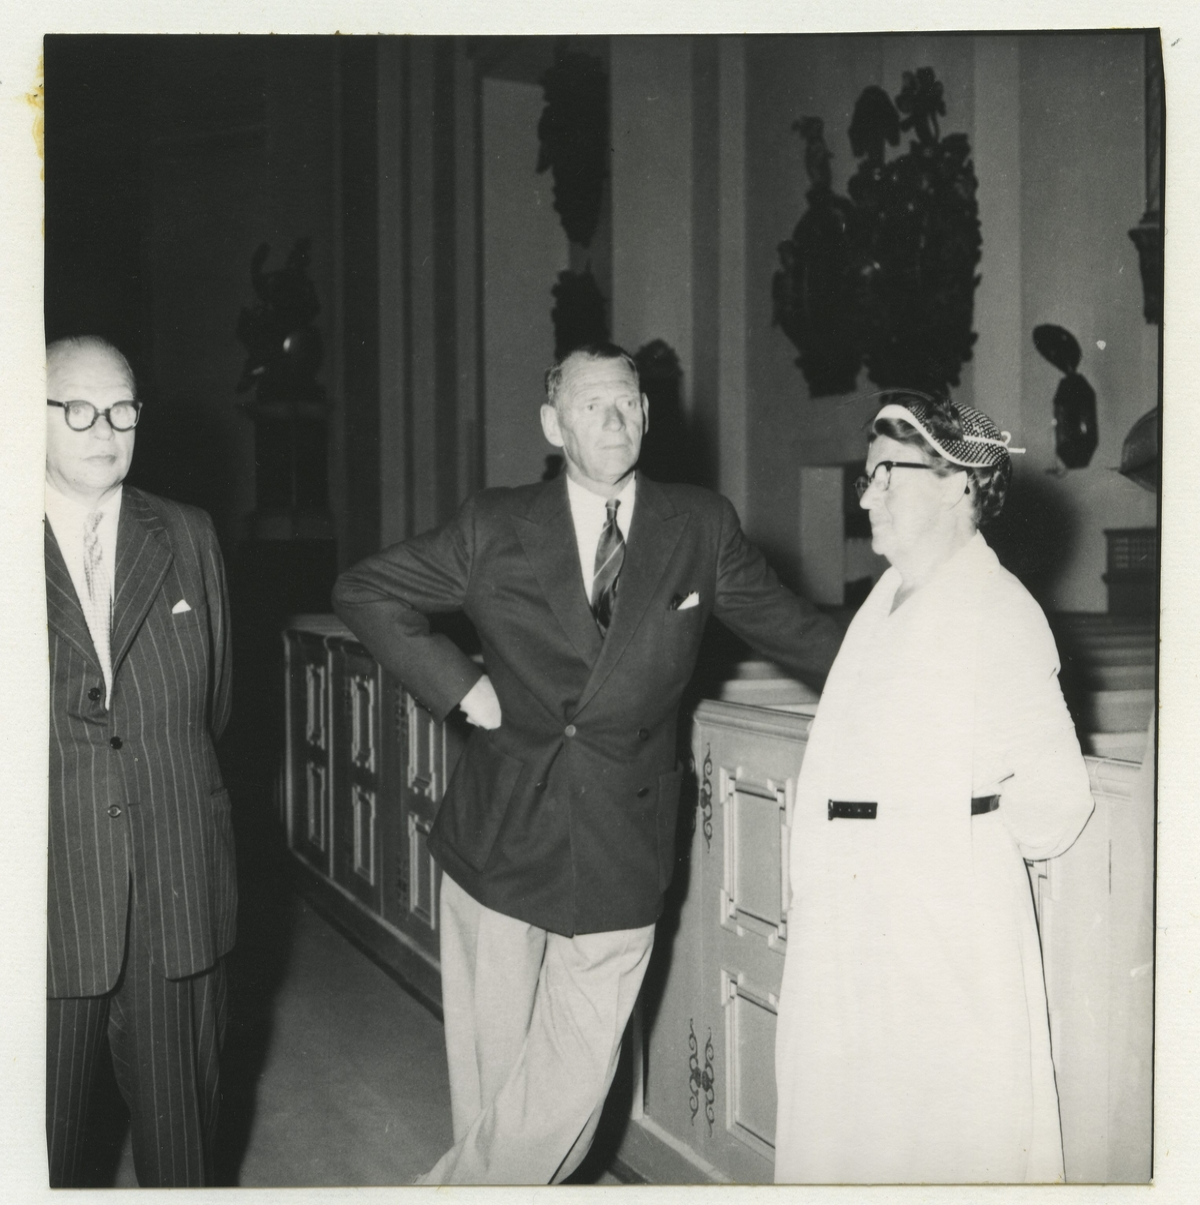 Konung Frederik och landshövding Wagnsson med fru.